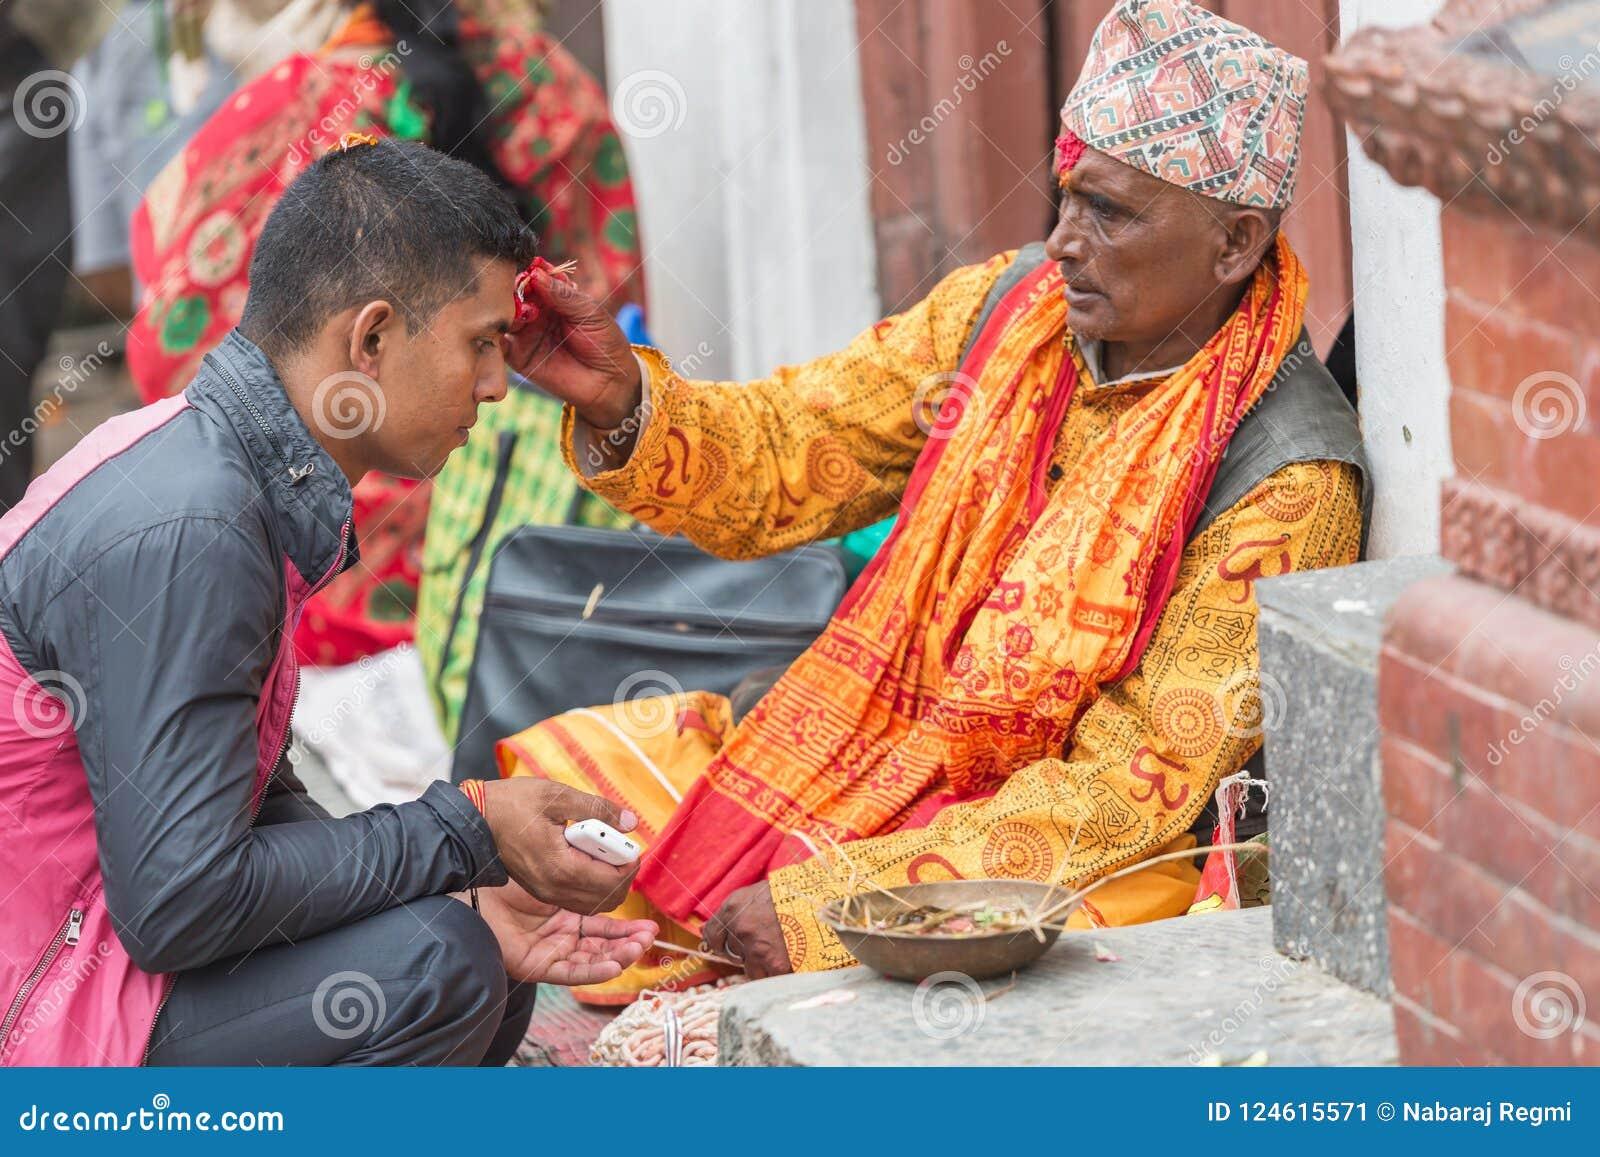 Hindu Pople Receiving Raksha Bandhan at Pashupatinath Temple in